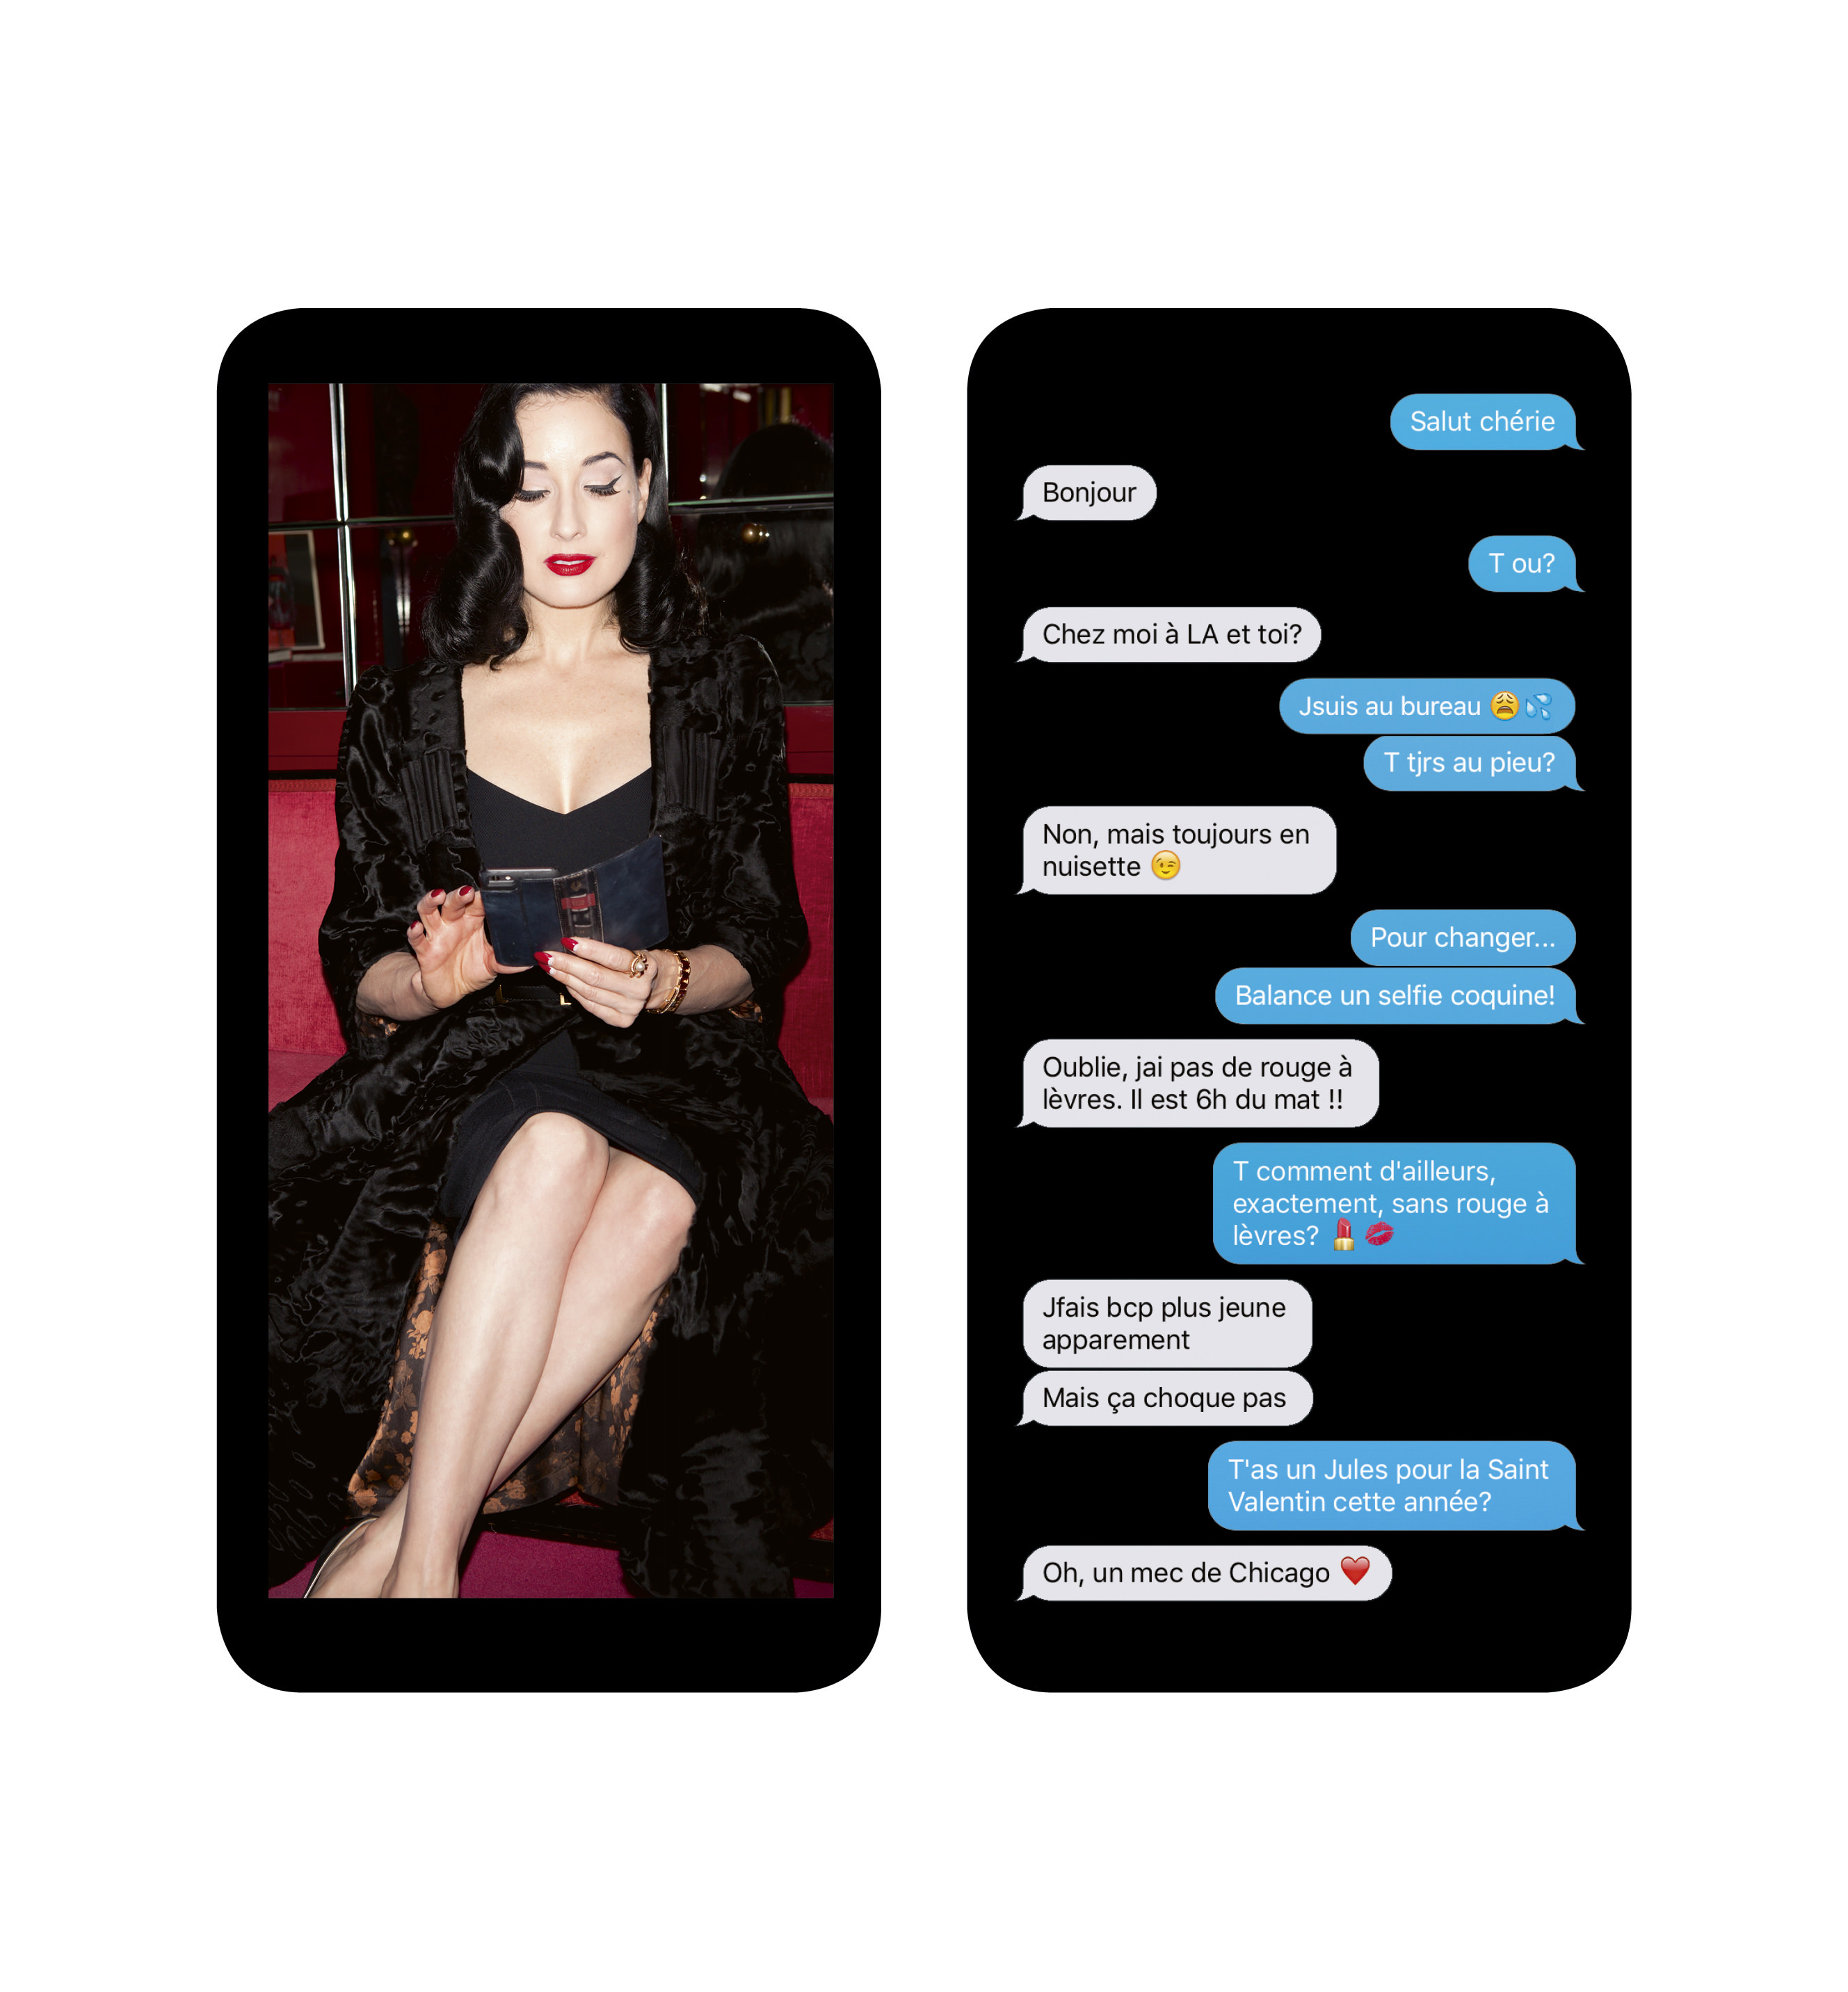 El mensajero kevin costner online dating